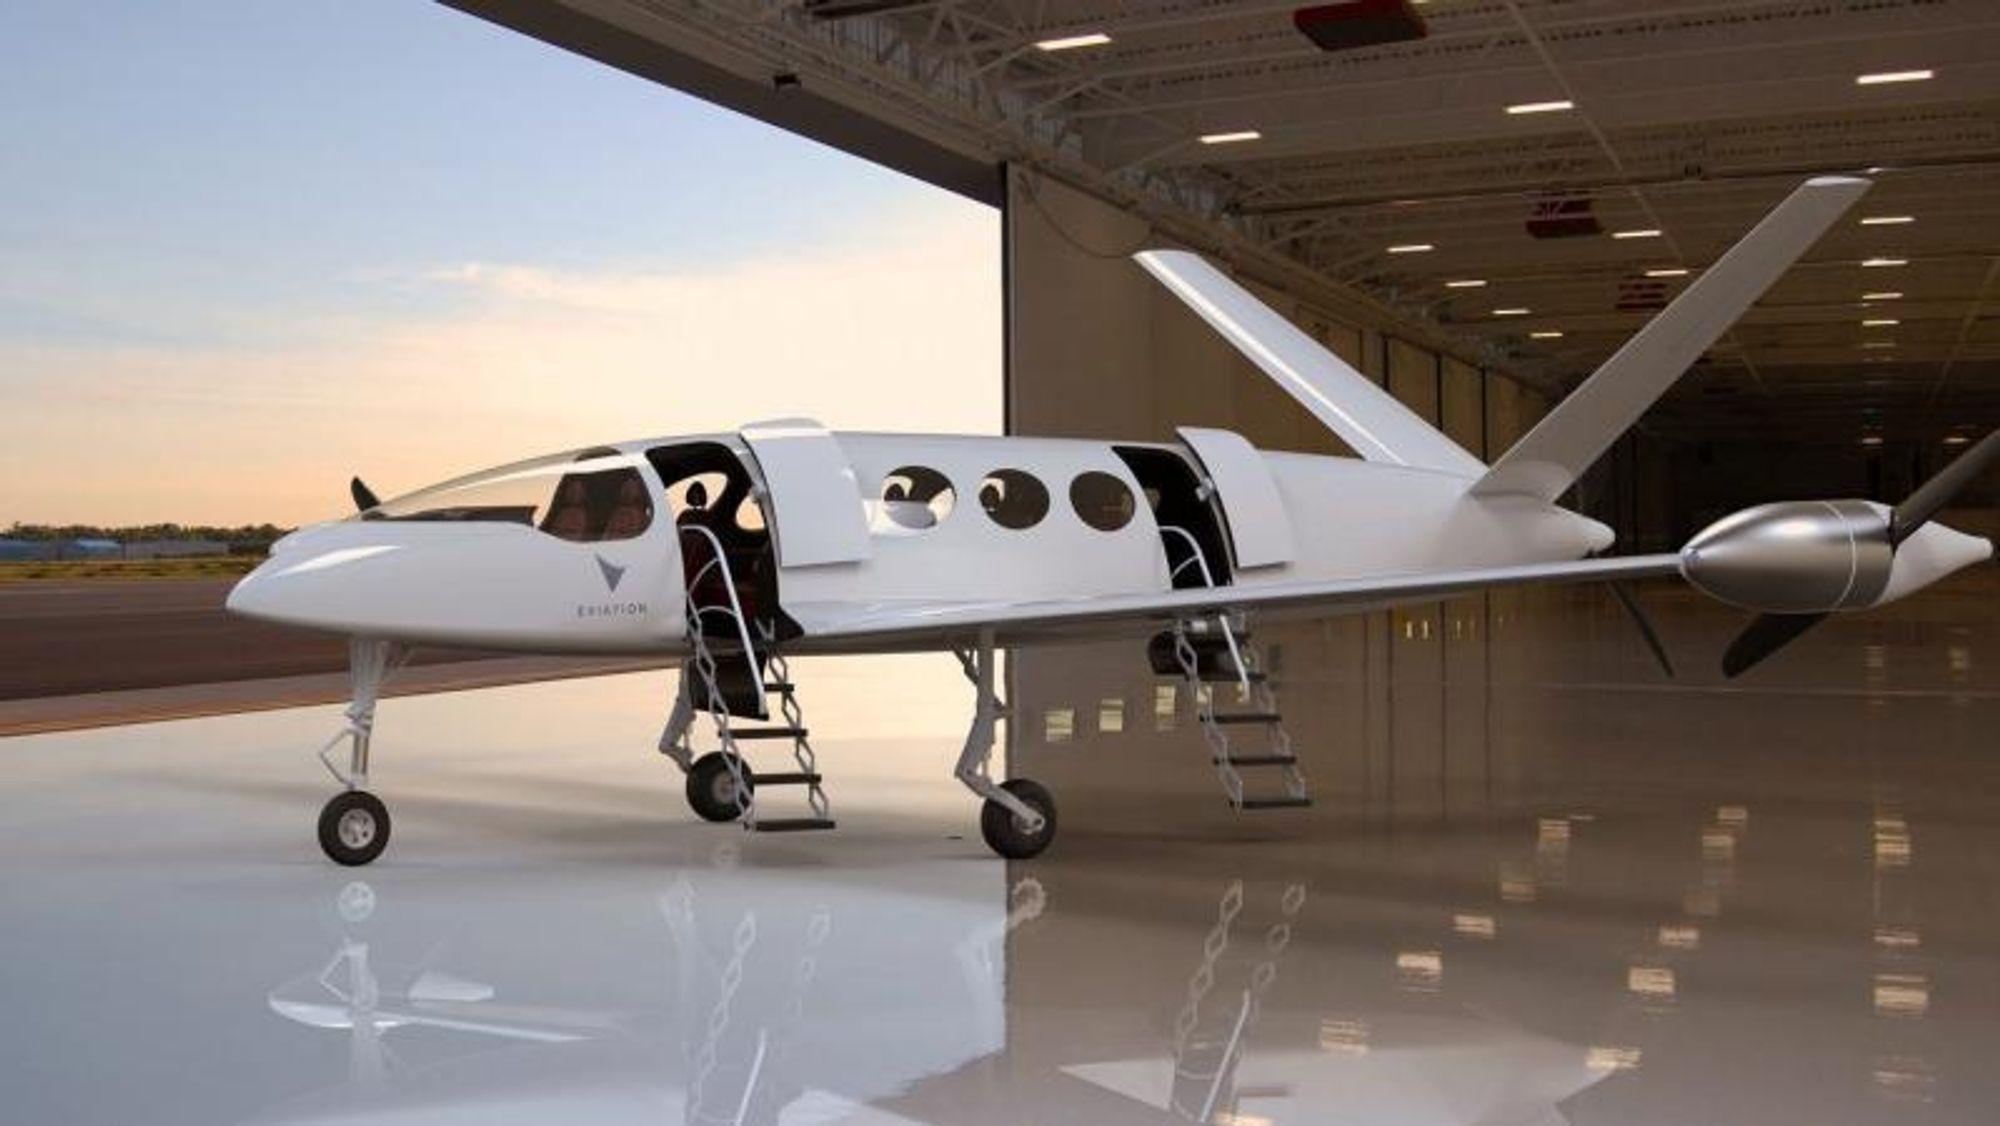 Prototypen Alice fra israelske Eviation betegnes som en lovende prosjektene innen el-passasjerfly.